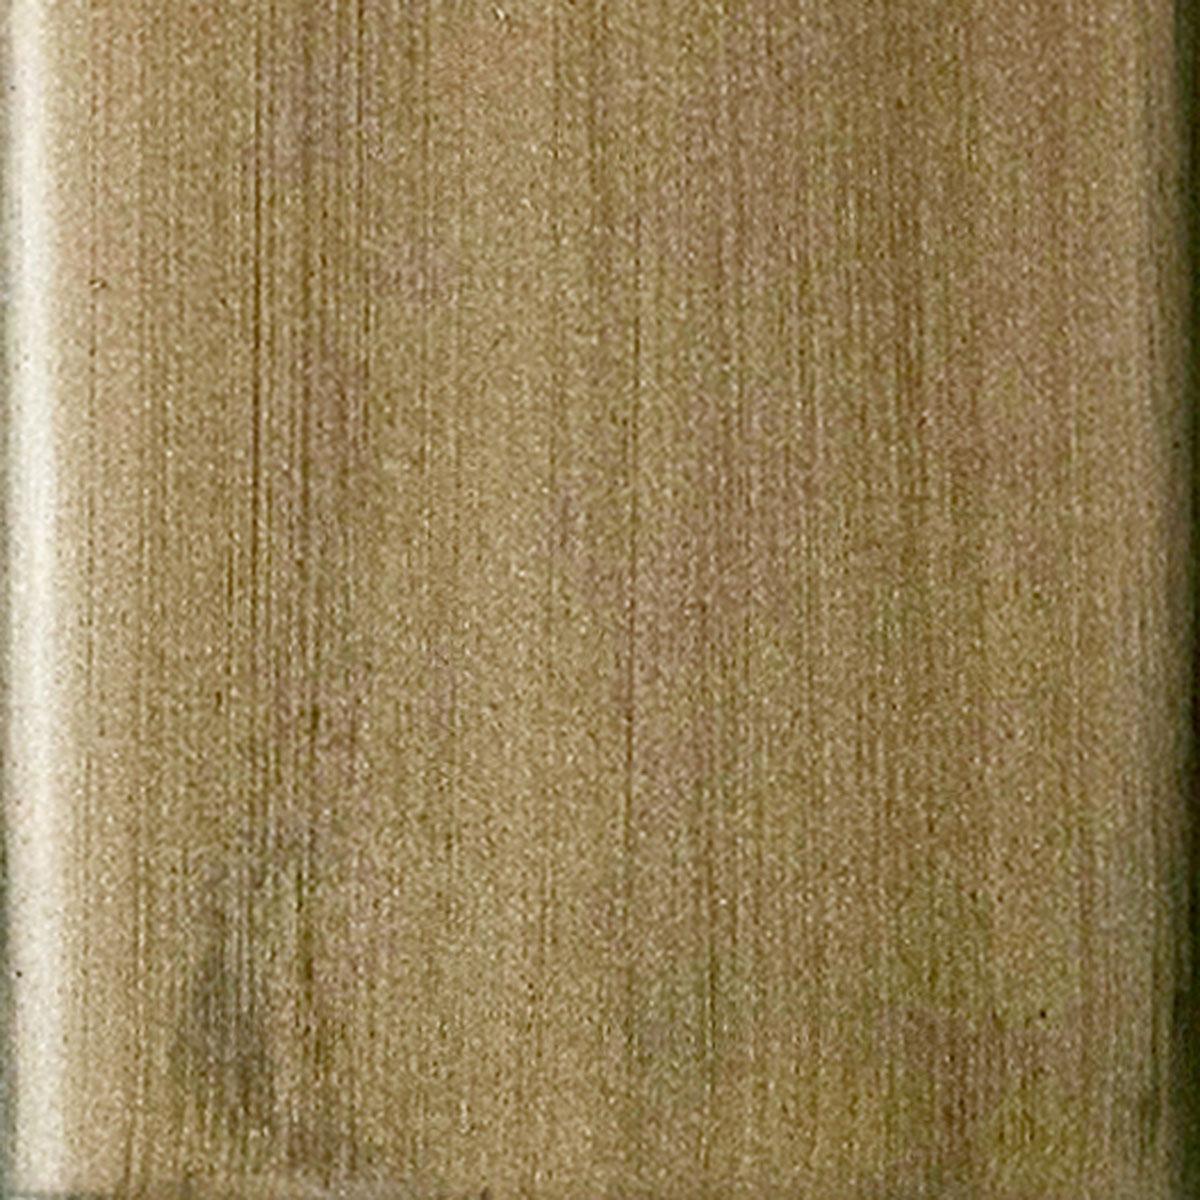 Glazed Powder Coat